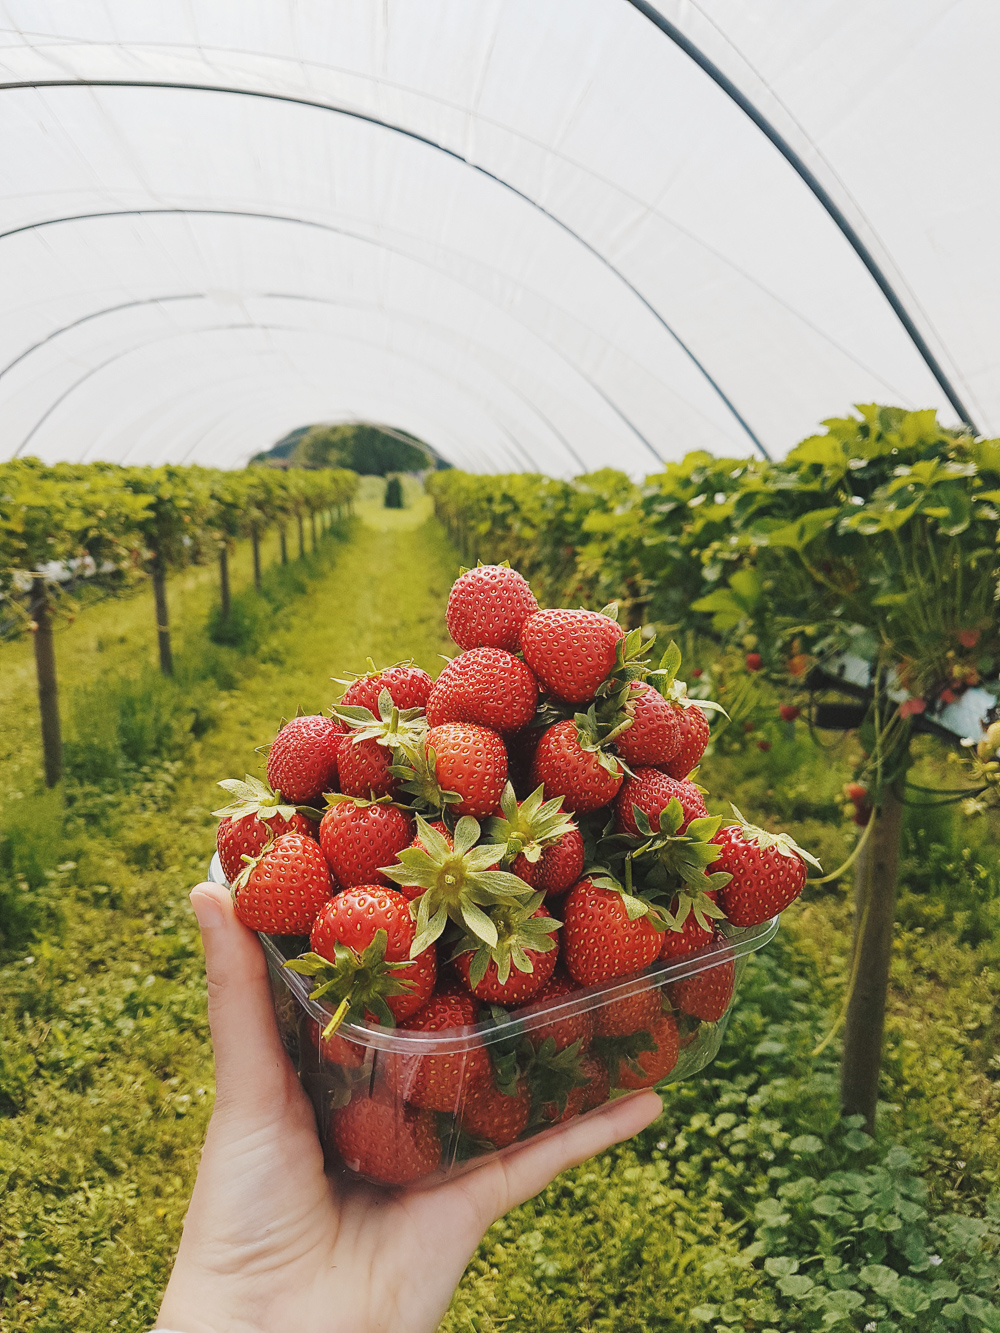 Strawberries from PYO Farm